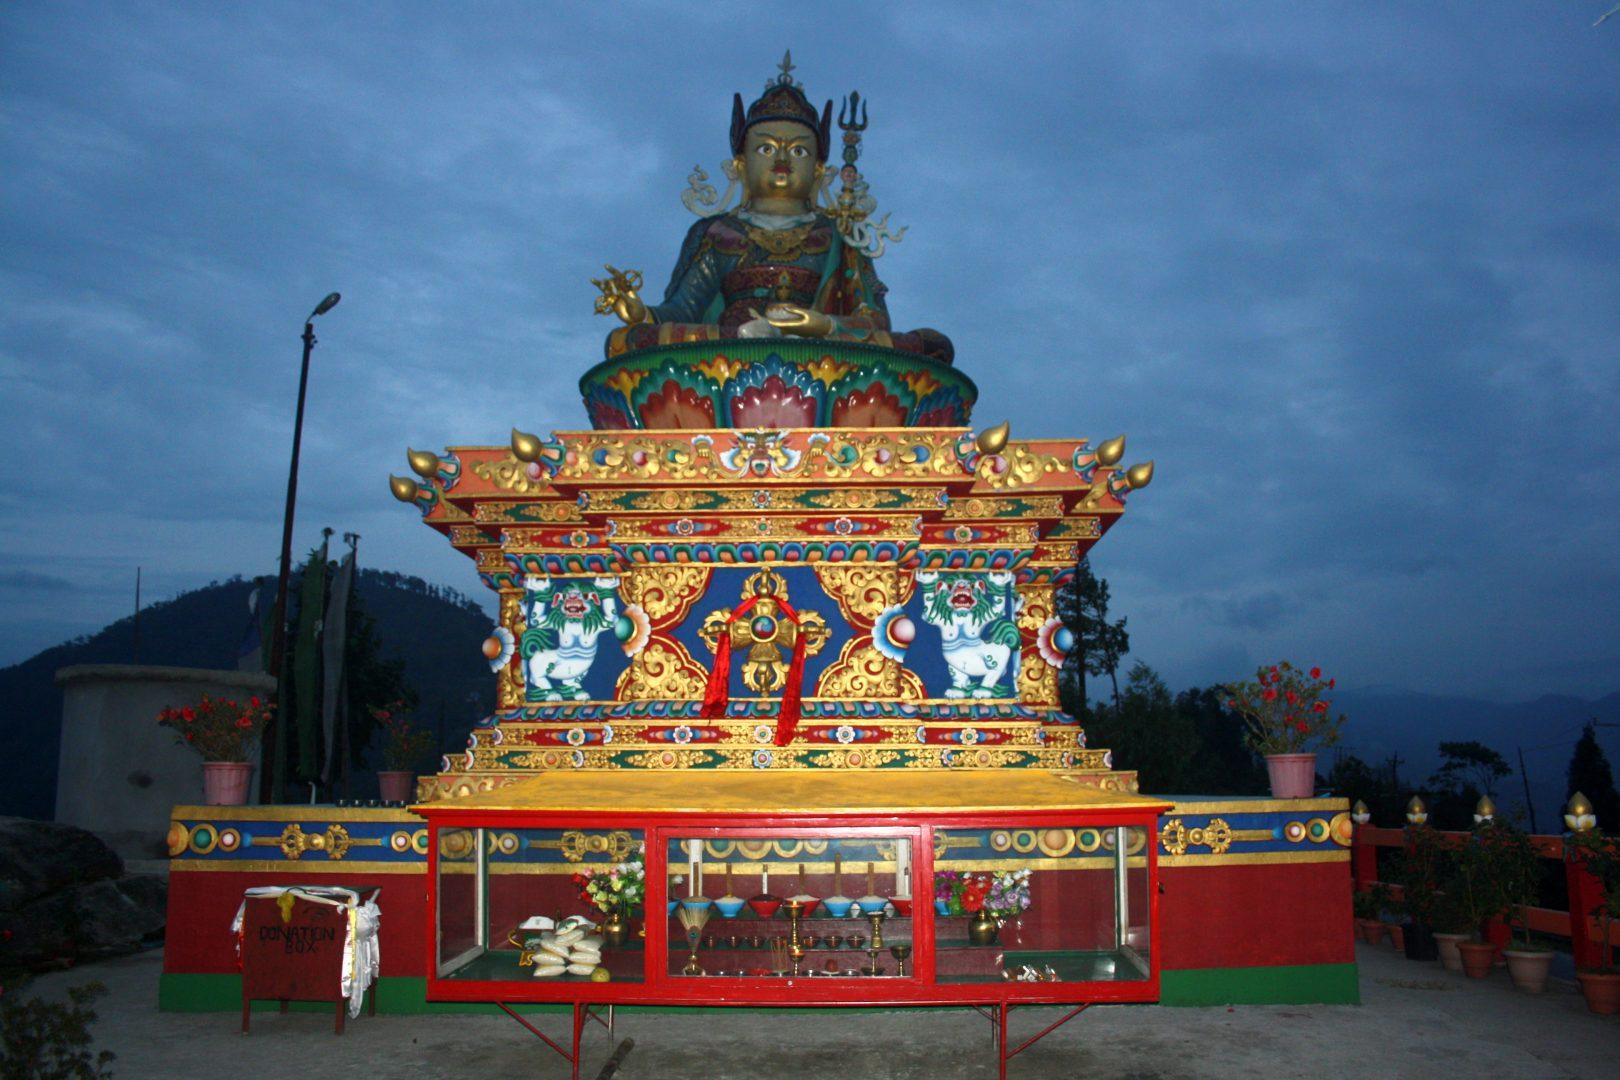 Temple Lord Shiva en soirée Kalimpong Inde